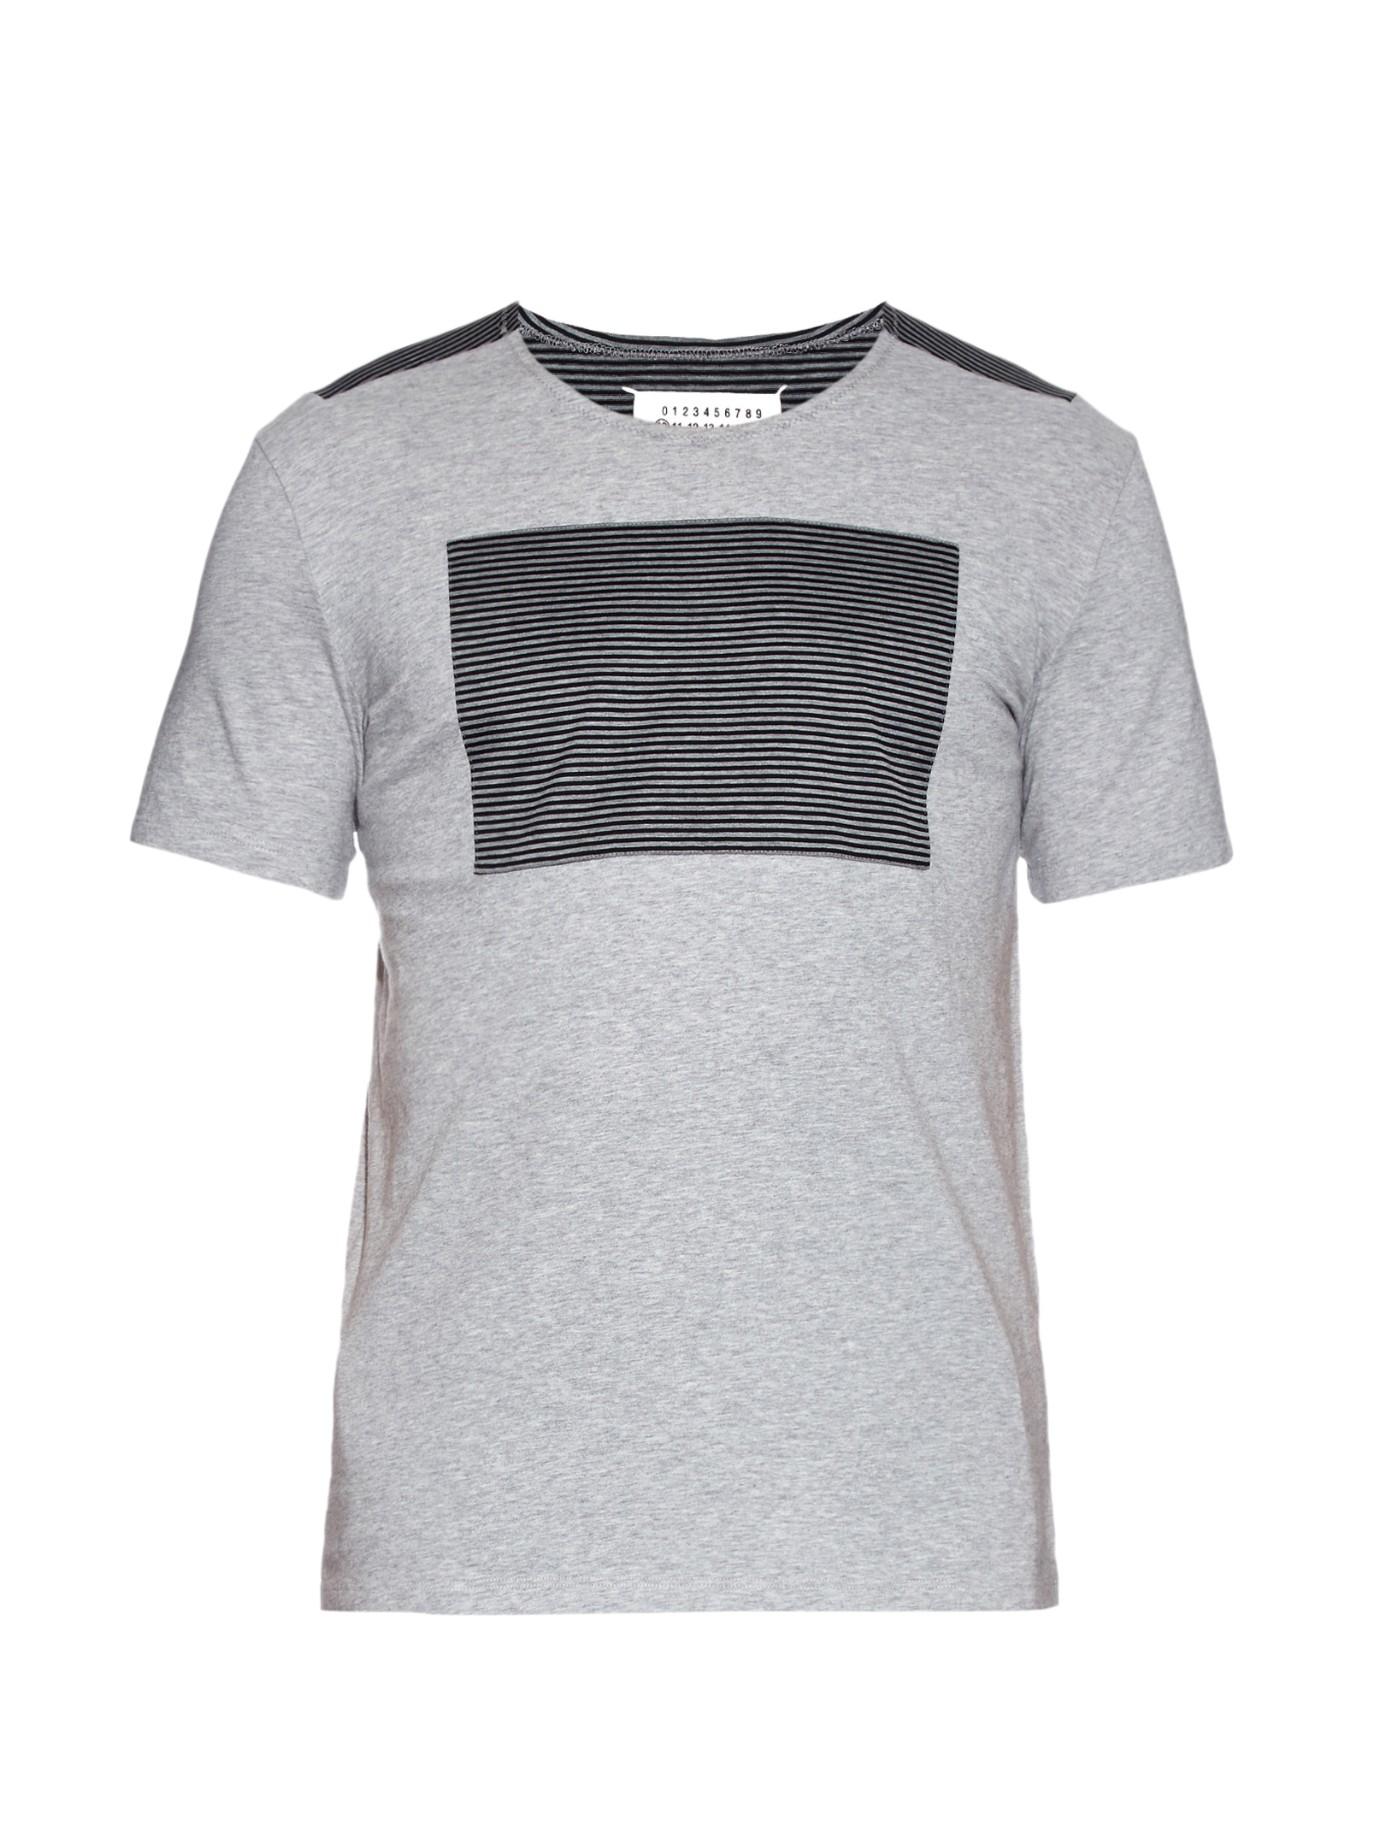 Maison margiela striped panels cotton jersey t shirt in Grey striped t shirt